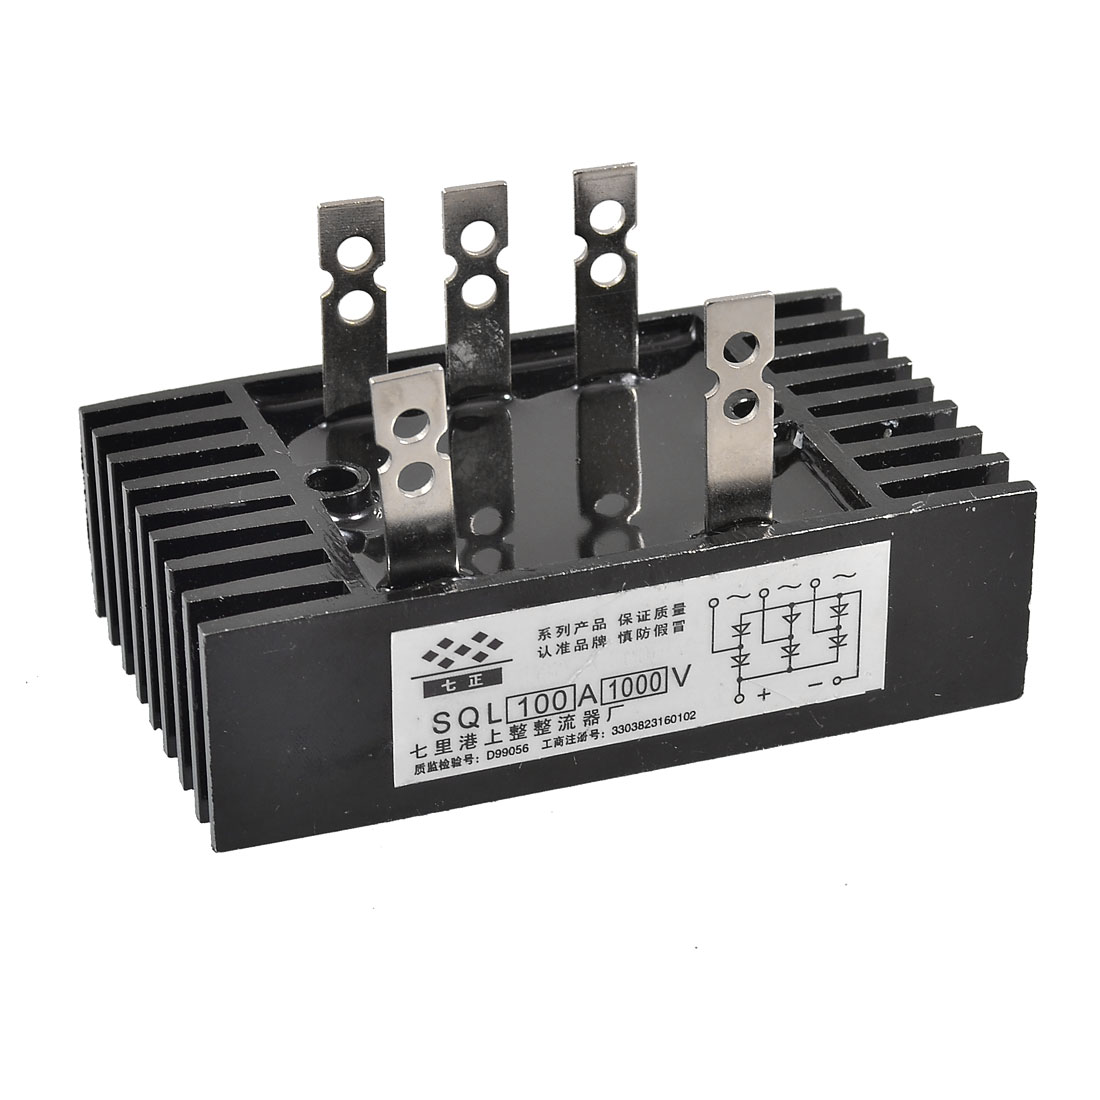 SQL 100A 1000V 3 Phase Diode Metal Case Bridge Rectifier